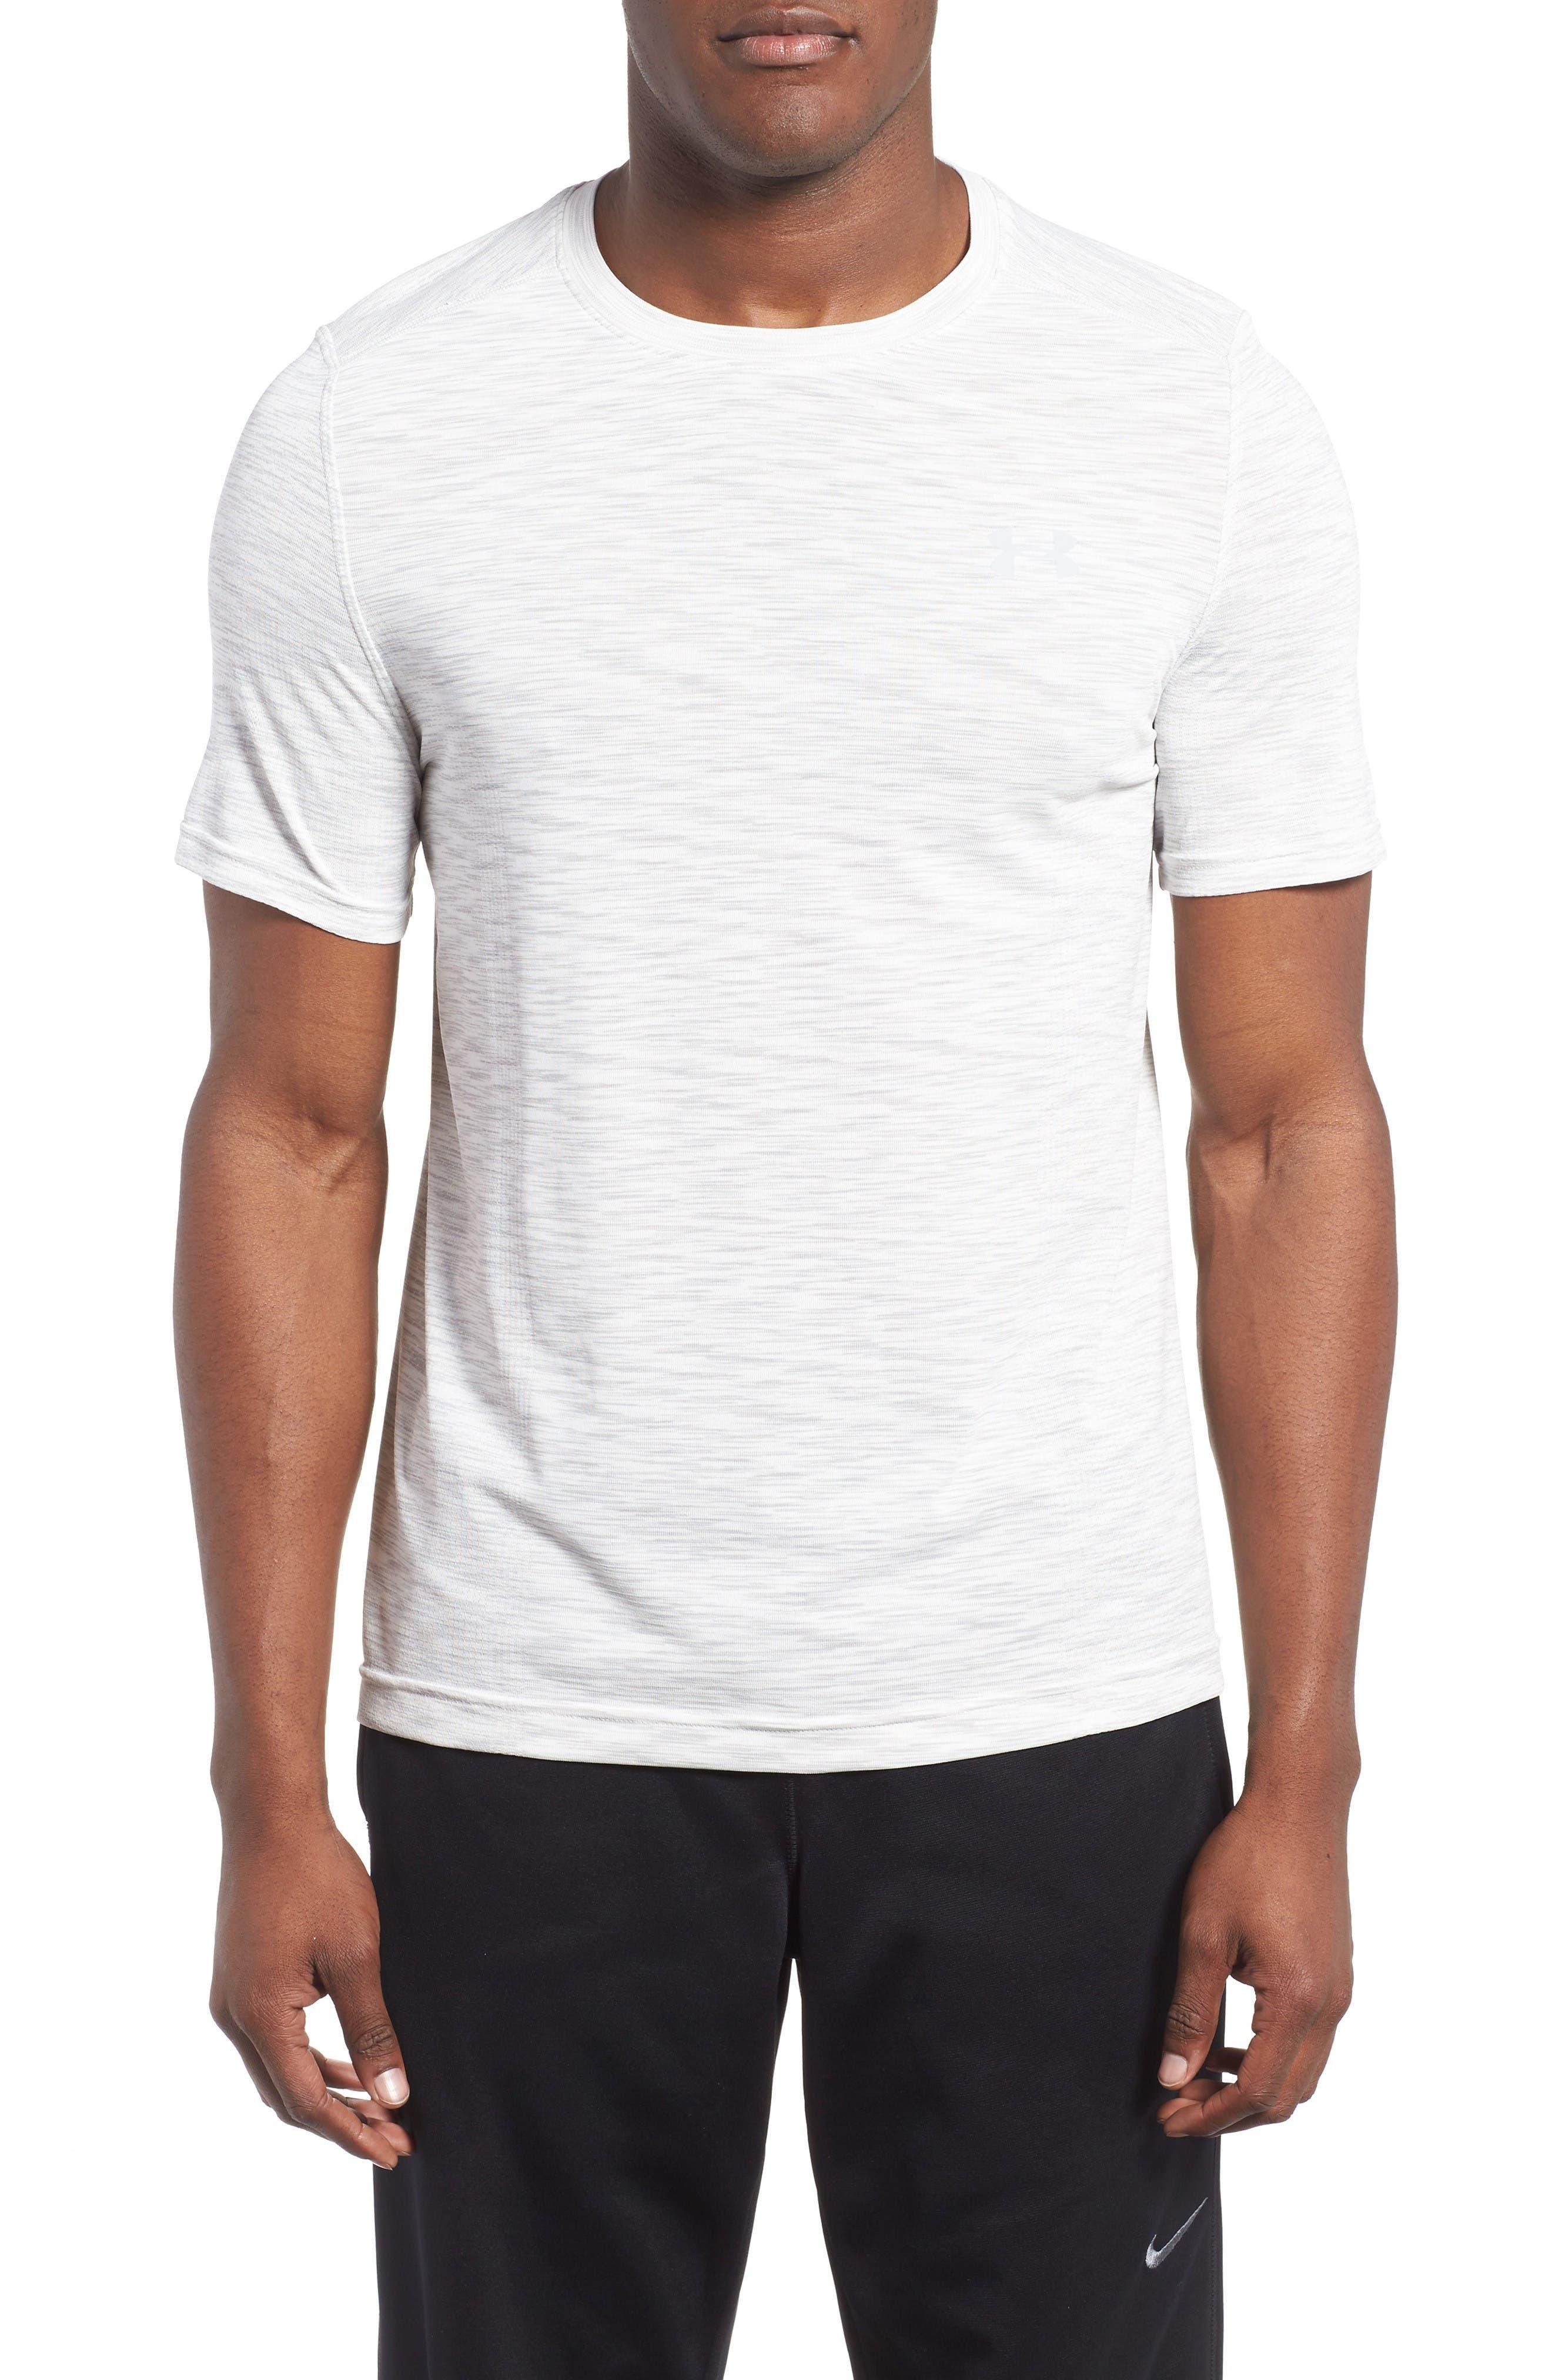 Main Image - Under Armour Threadborne Regular Fit T-Shirt